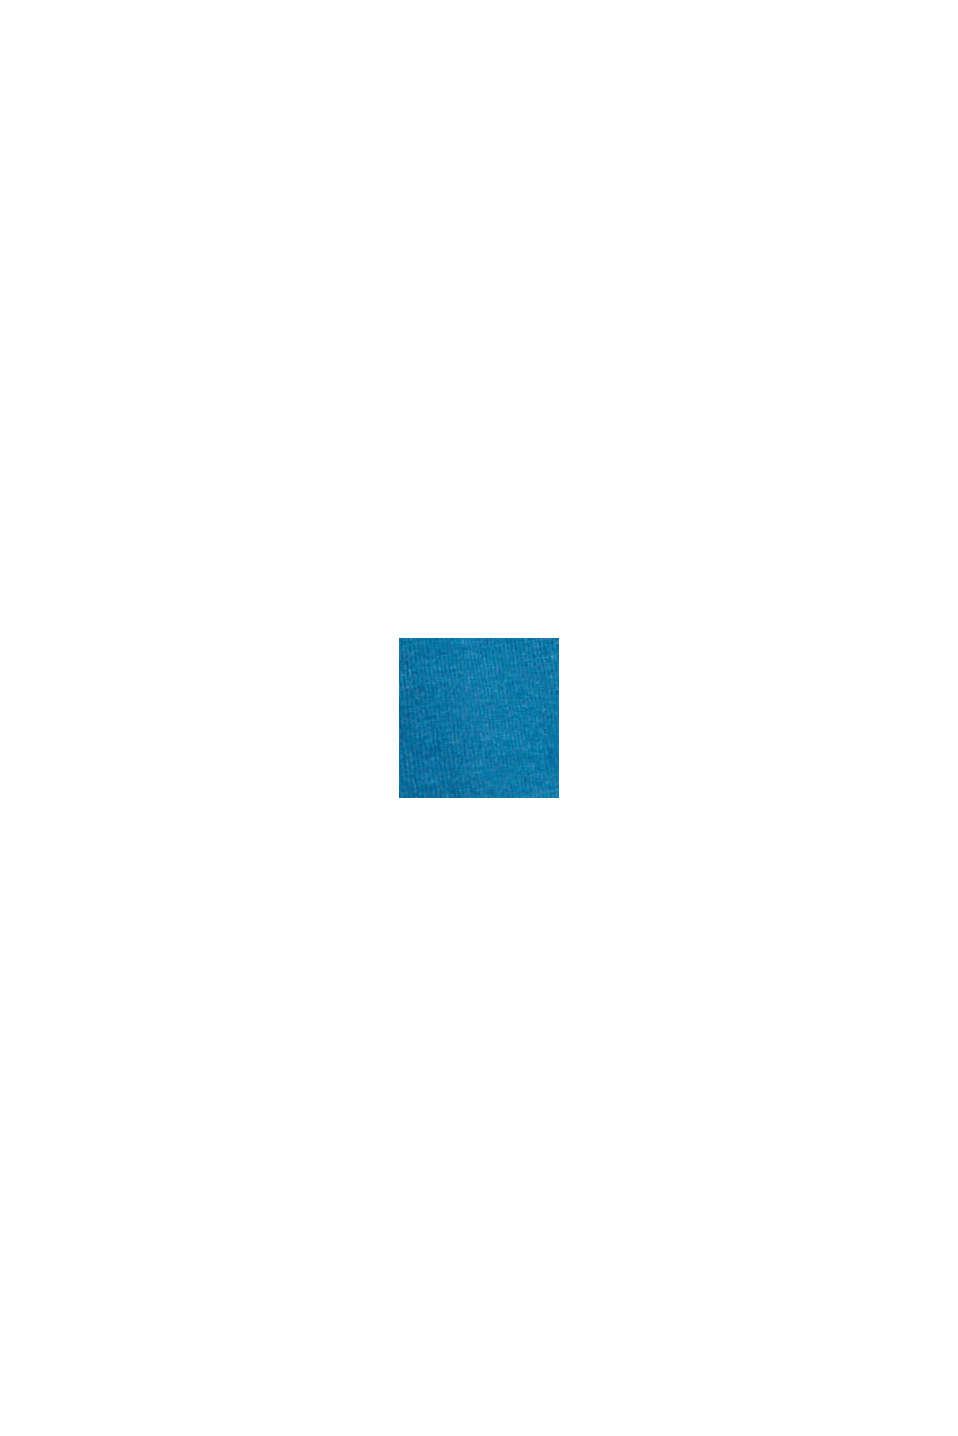 T-Shirts, PETROL BLUE, swatch